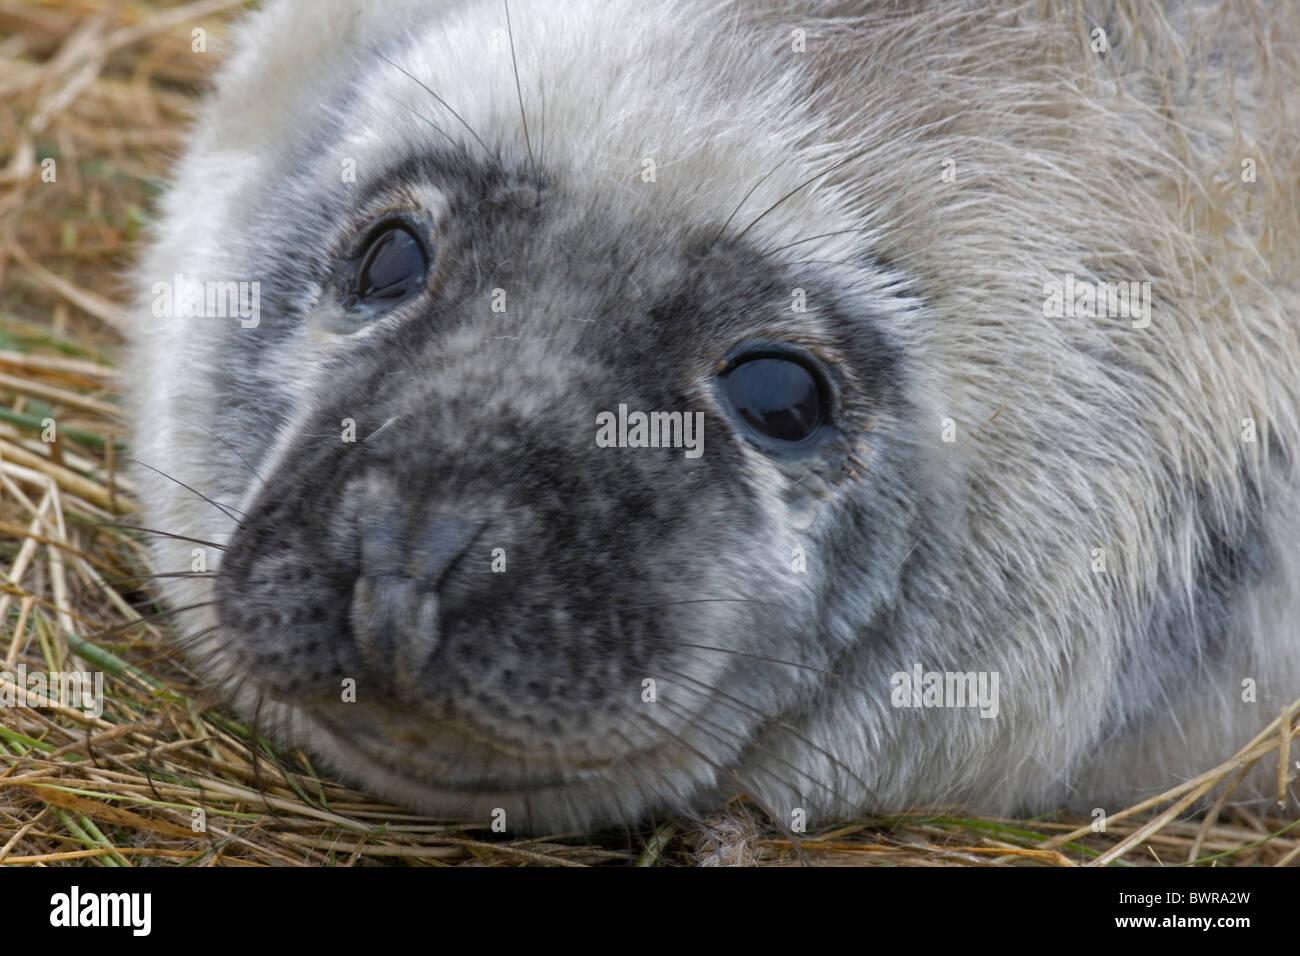 Grey Seal (Halichoerus grypus) - Pup portrait - UK - Stock Image